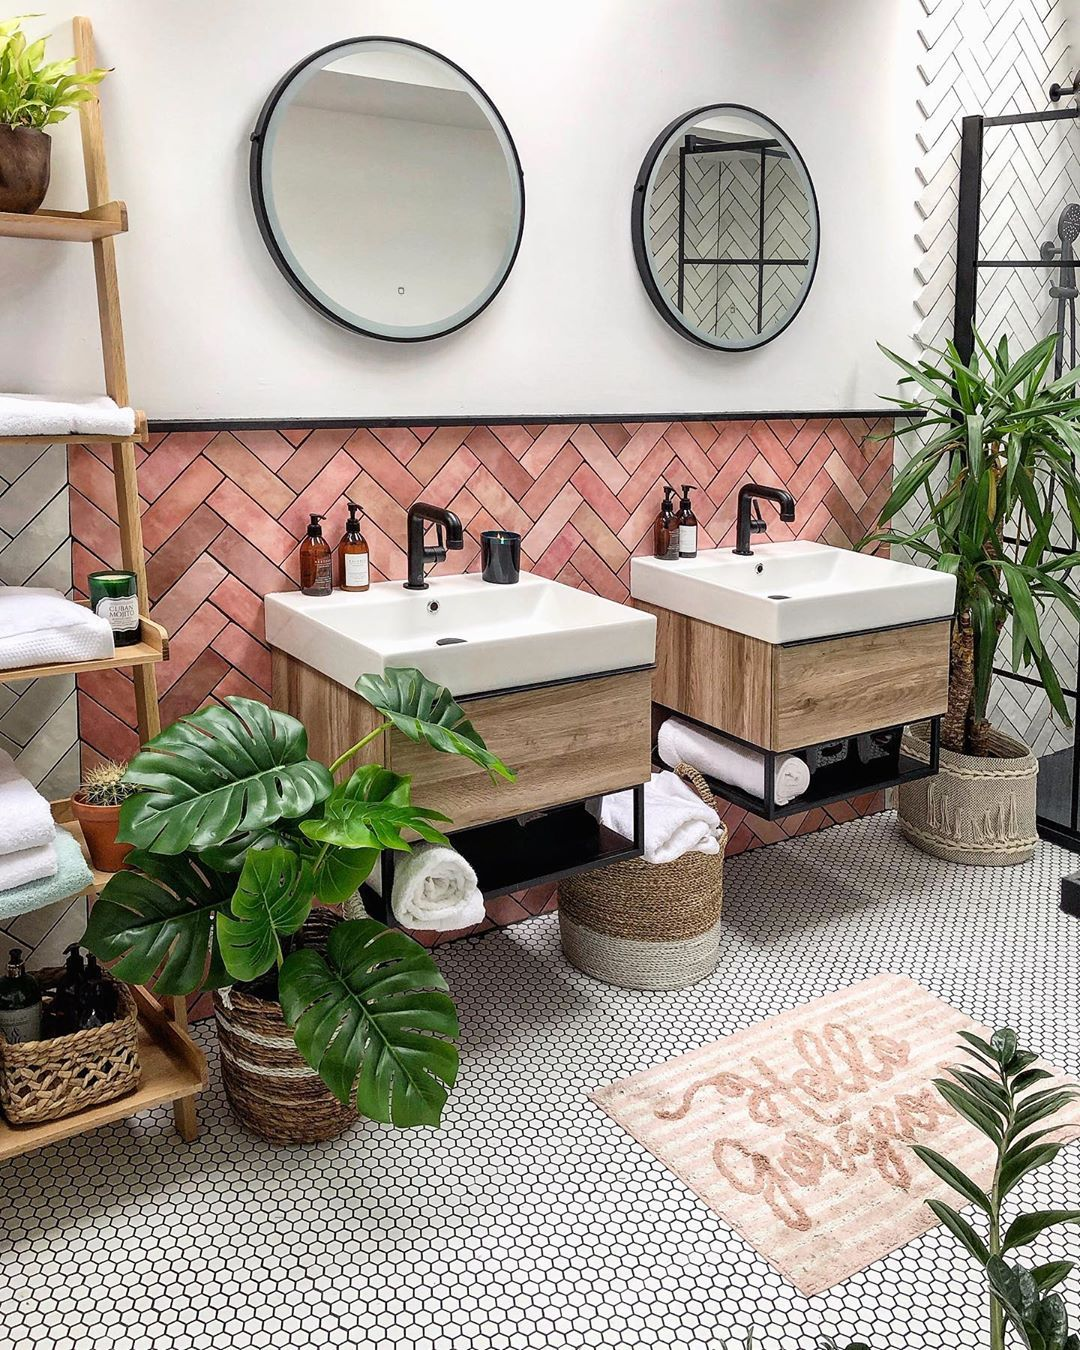 1 704 Otmetok Nravitsya 58 Kommentariev Eniko Mydarkhome V Instagram It S Friday And The Wea Modern Small Bathrooms Pink Bathroom Jungle Bathroom